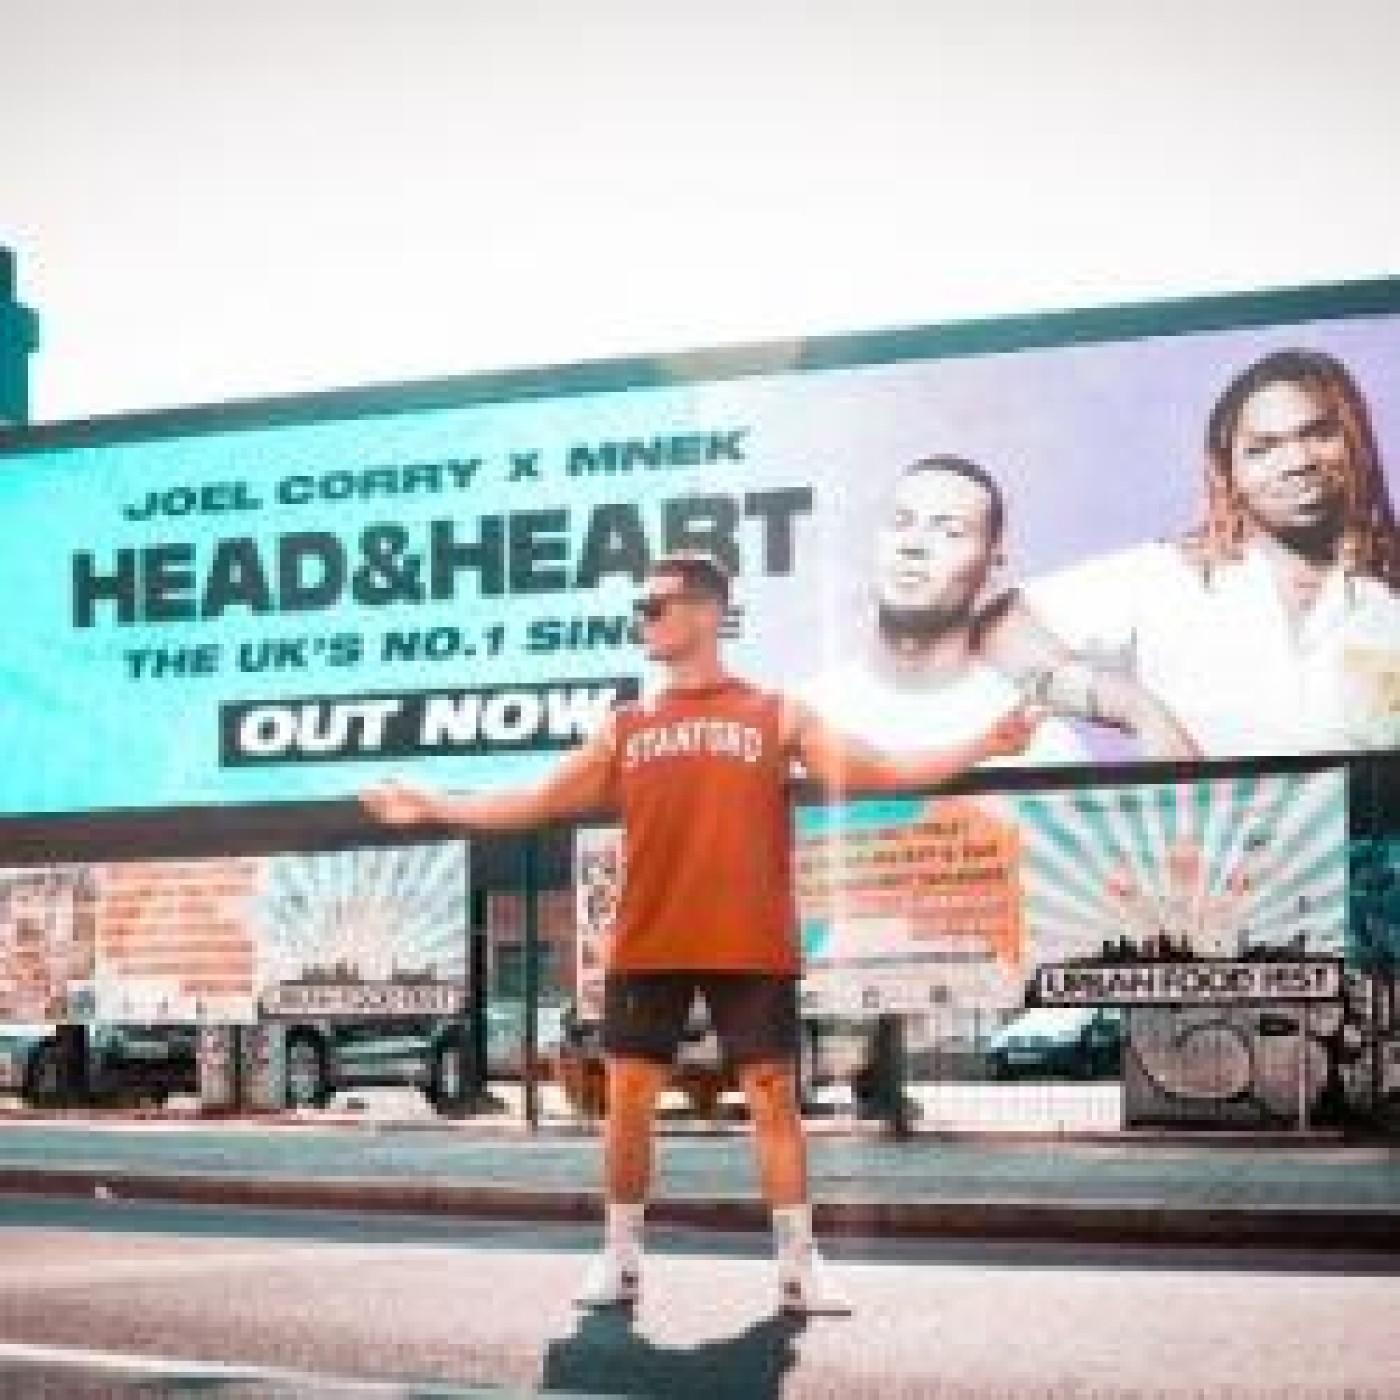 Music News de La Matinale FG : Head & Heart de Joel Corry